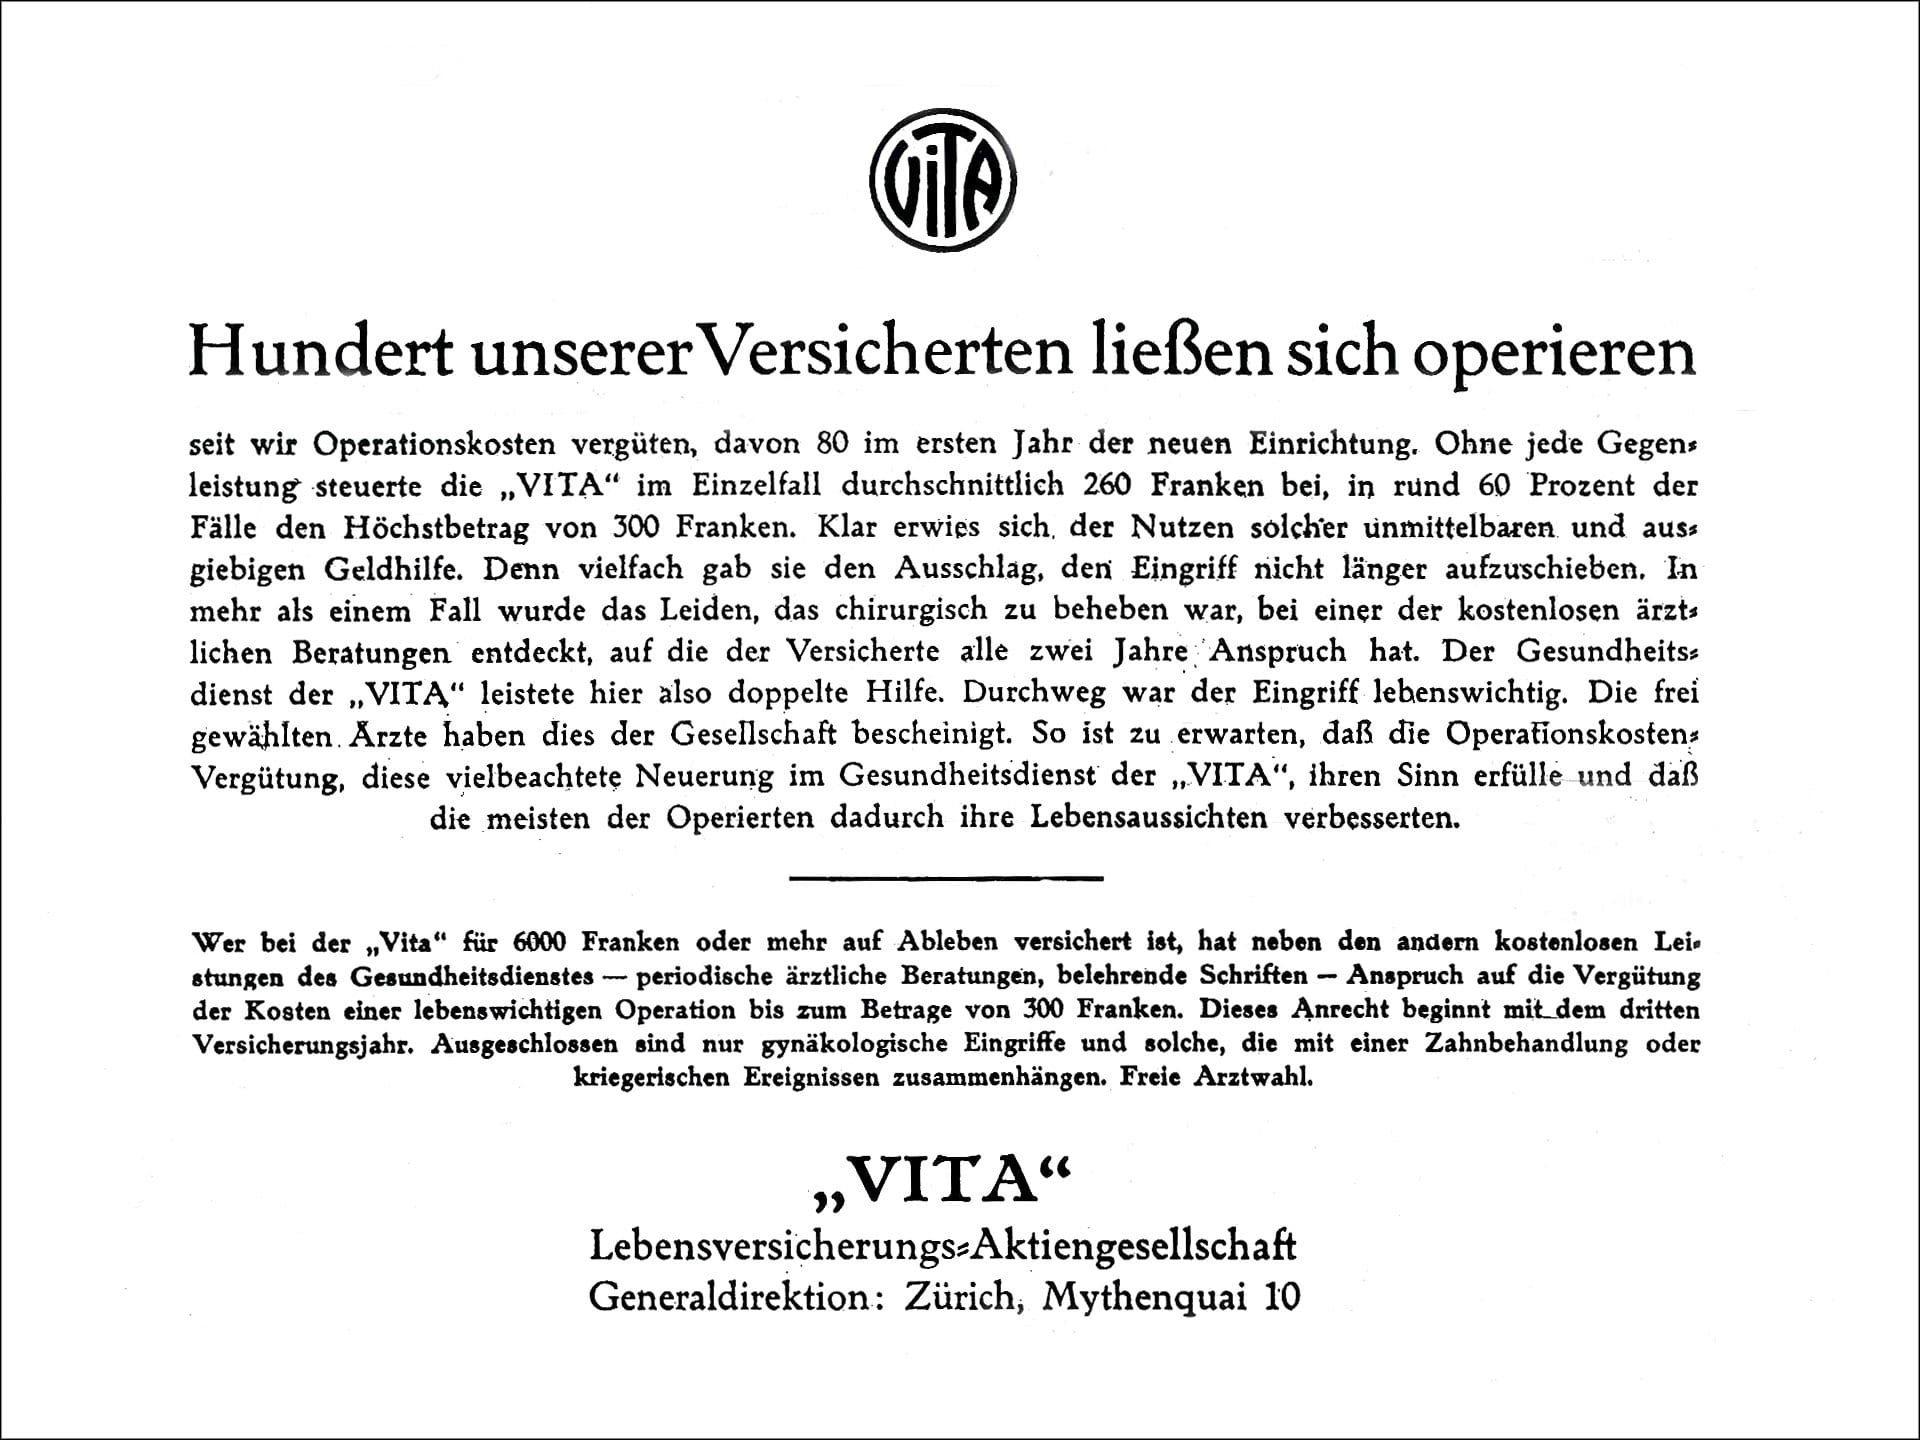 1940: Vita spendiert sogar Operationen